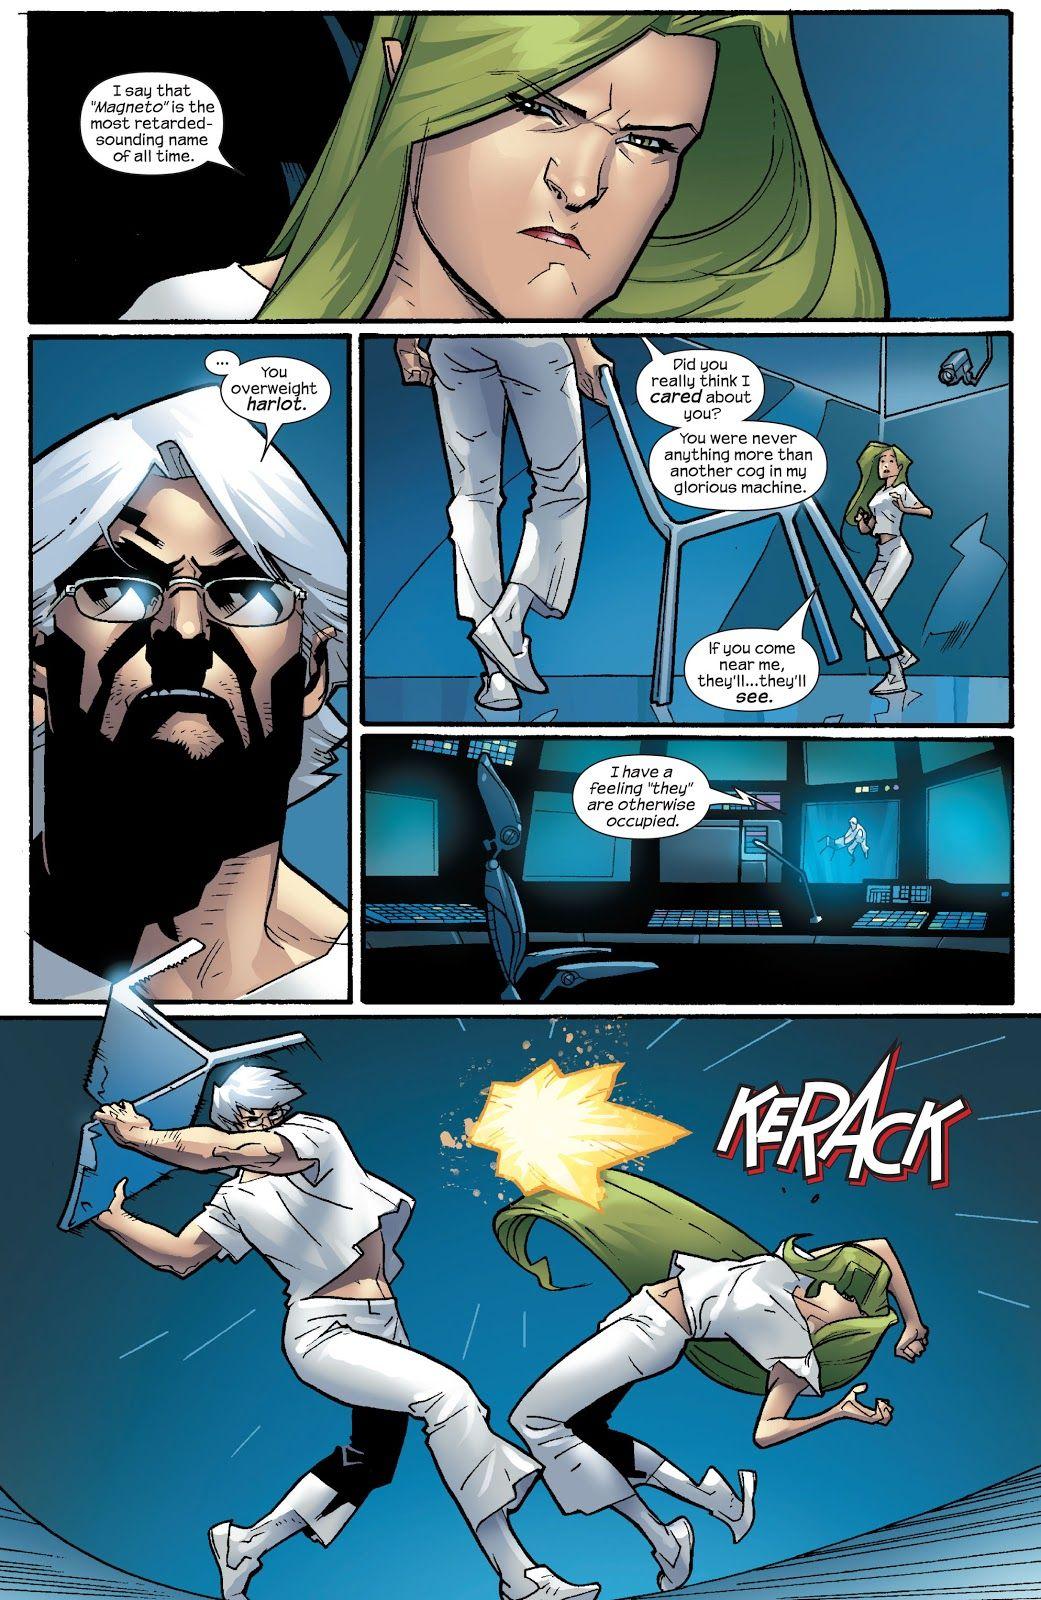 Ultimate X Men Issue 64 Read Ultimate X Men Issue 64 Comic Online In High Quality X Men Comic Art Comics